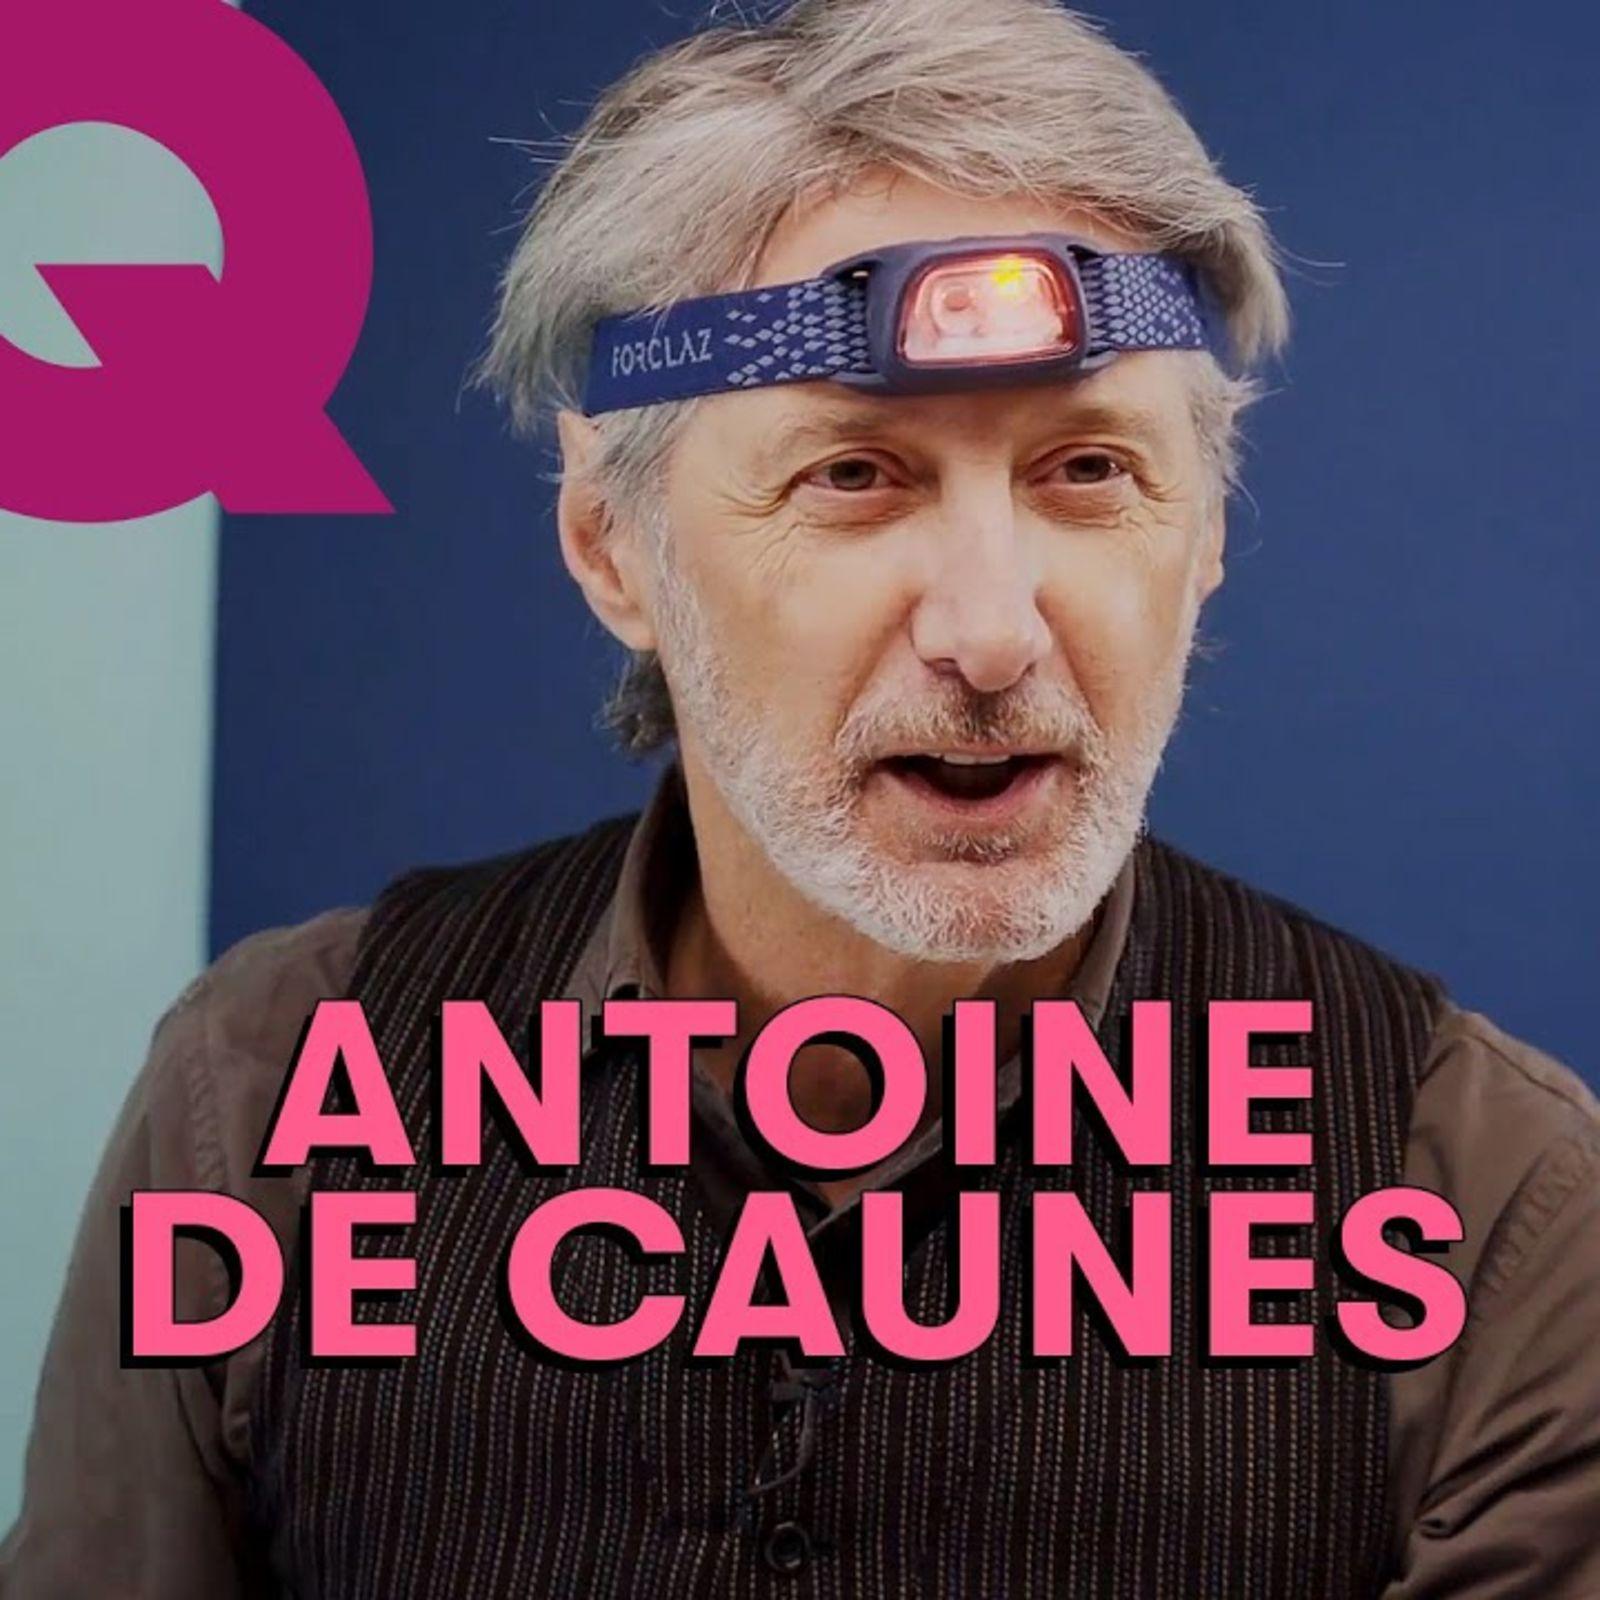 Les 10 Essentiels d'Antoine de Caunes (appareil photo, casquette, pipe...)